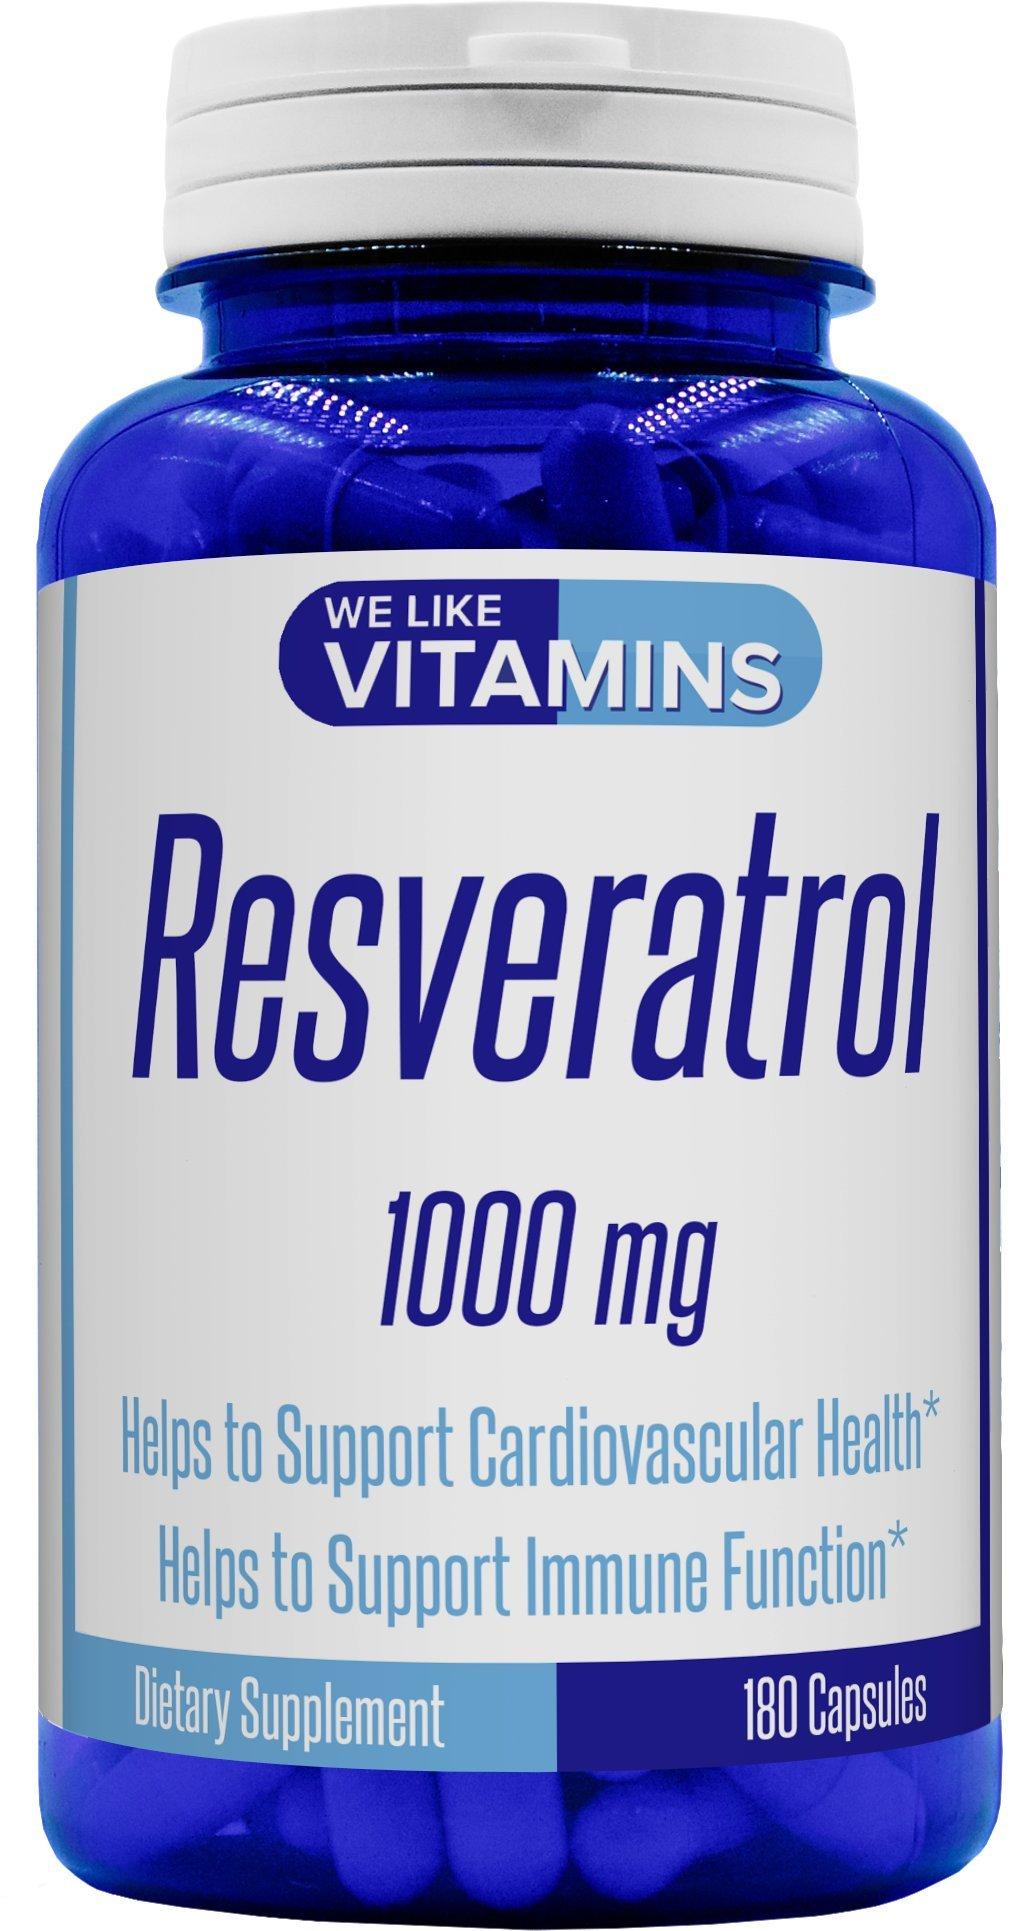 Resveratrol Capsules 1000mg Serving (Non GMO & Gluten Free) - 180 Capsules - Full 3 Month Supply - Antioxidant Trans Resveratrol Supplement